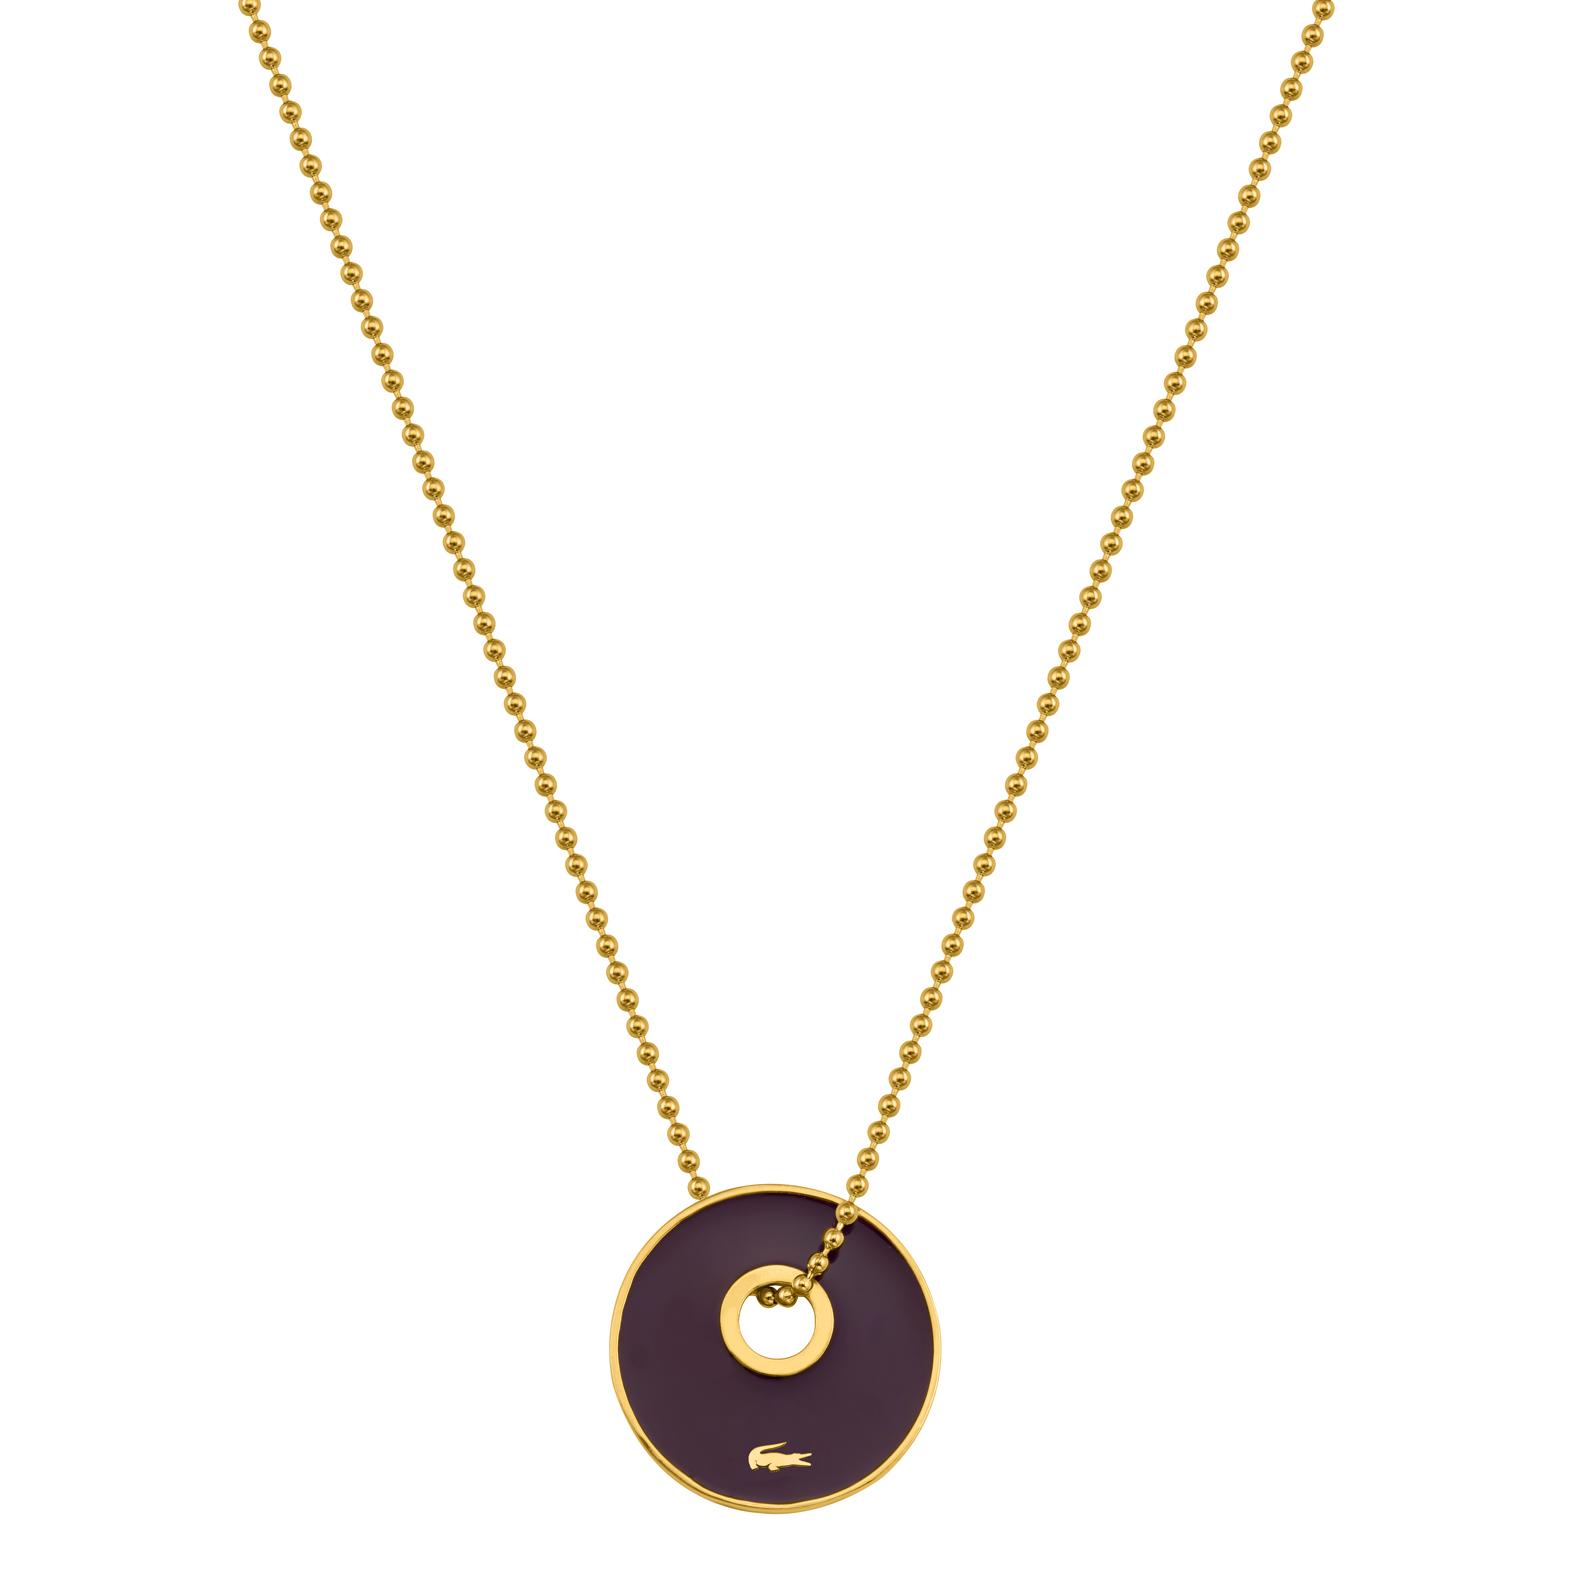 Bijoux Fantaisies Orleans : Lacoste bijoux